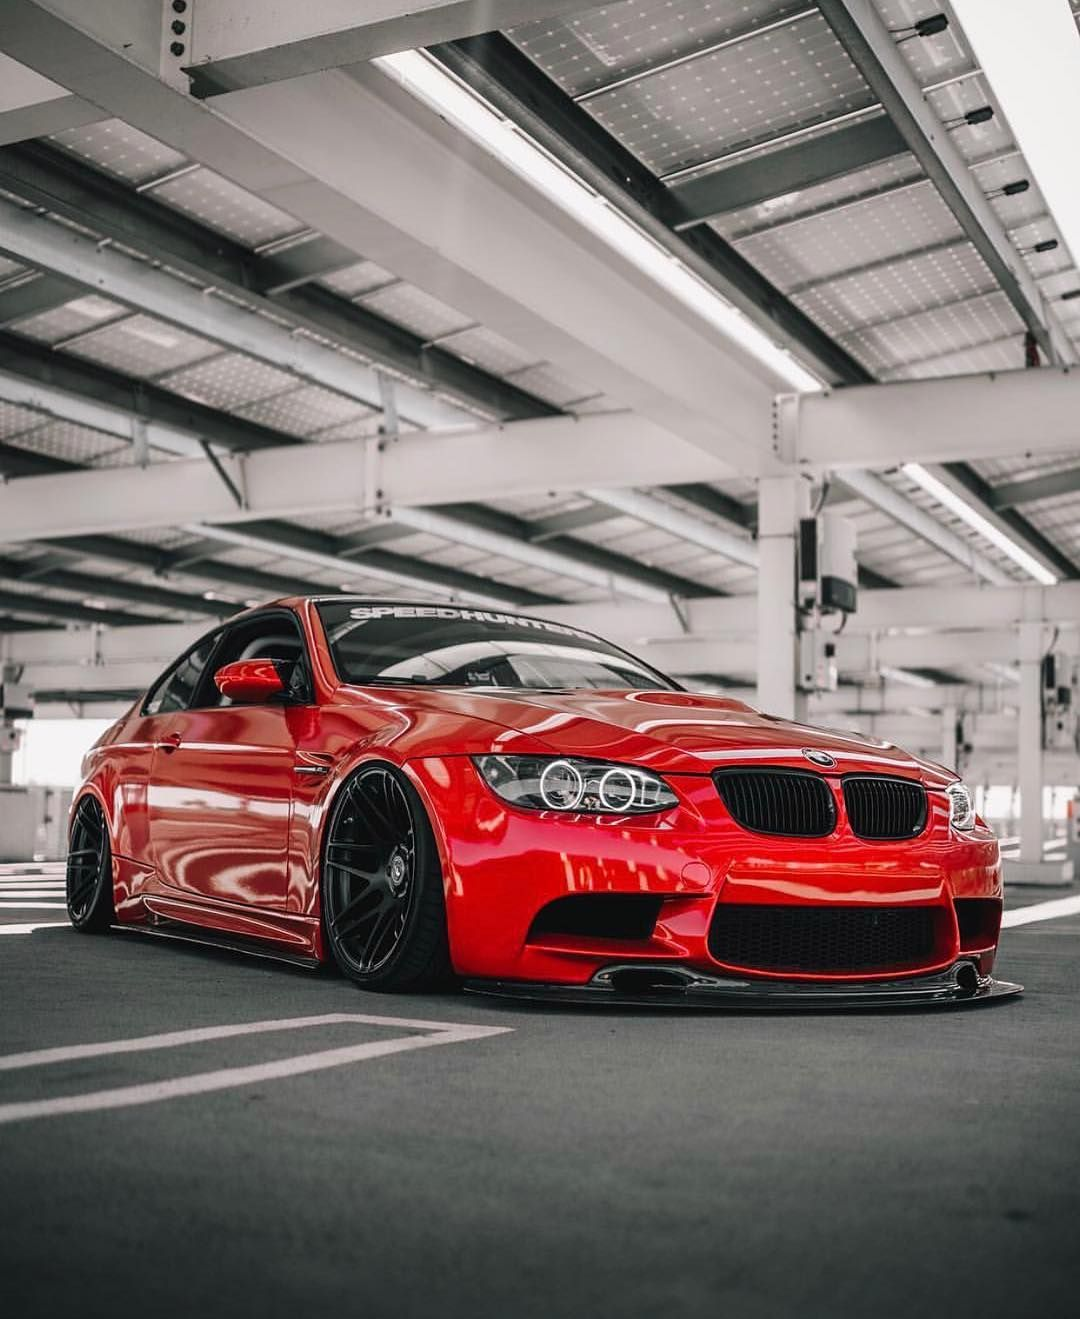 bmw e92 m3 red slammed [ 1080 x 1319 Pixel ]